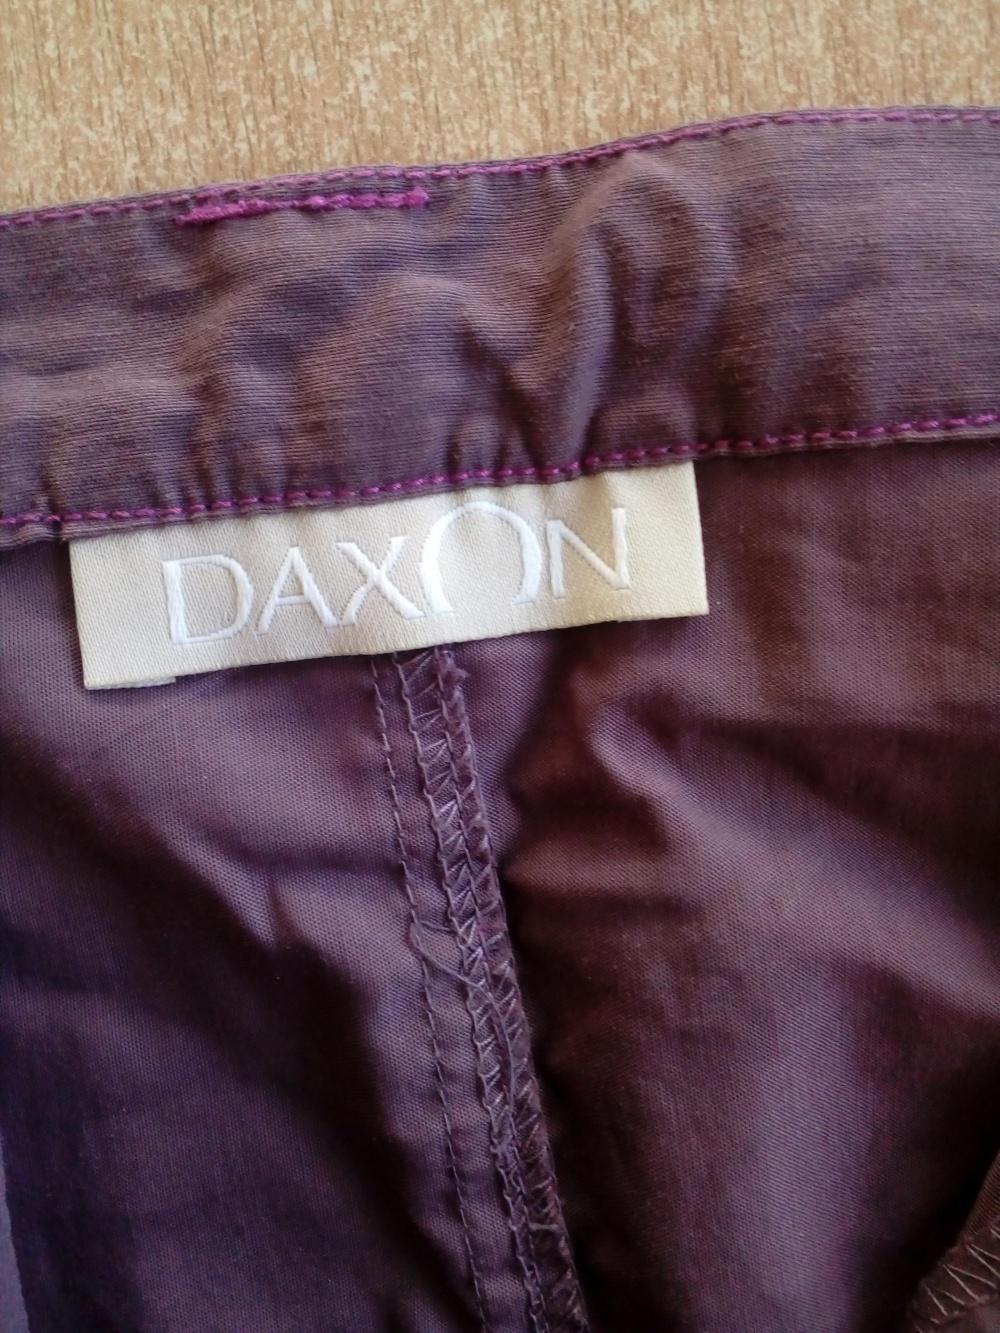 Юбка. Daxon. Р-р 46-48.